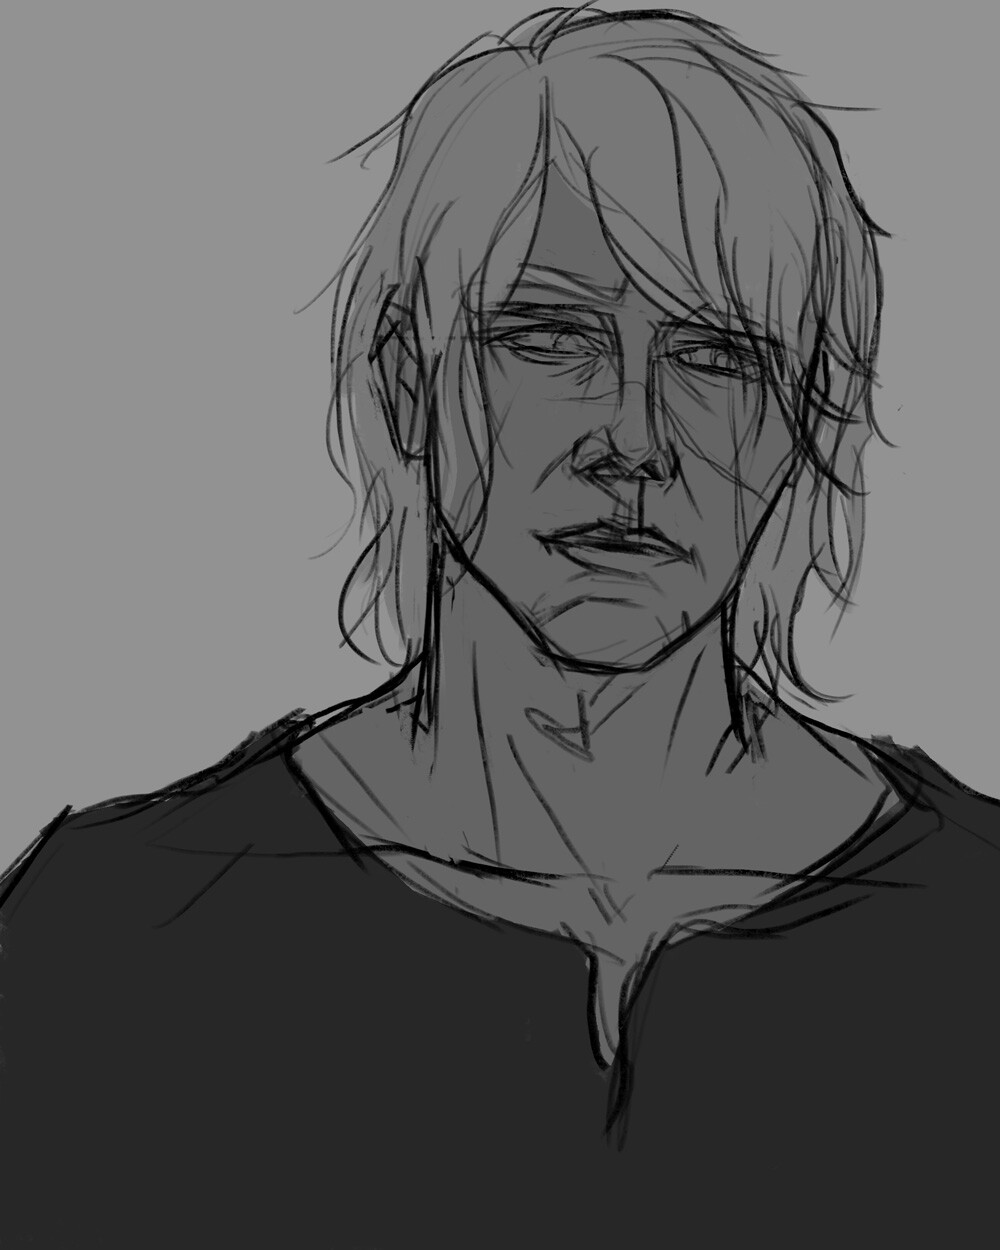 initial rough sketch